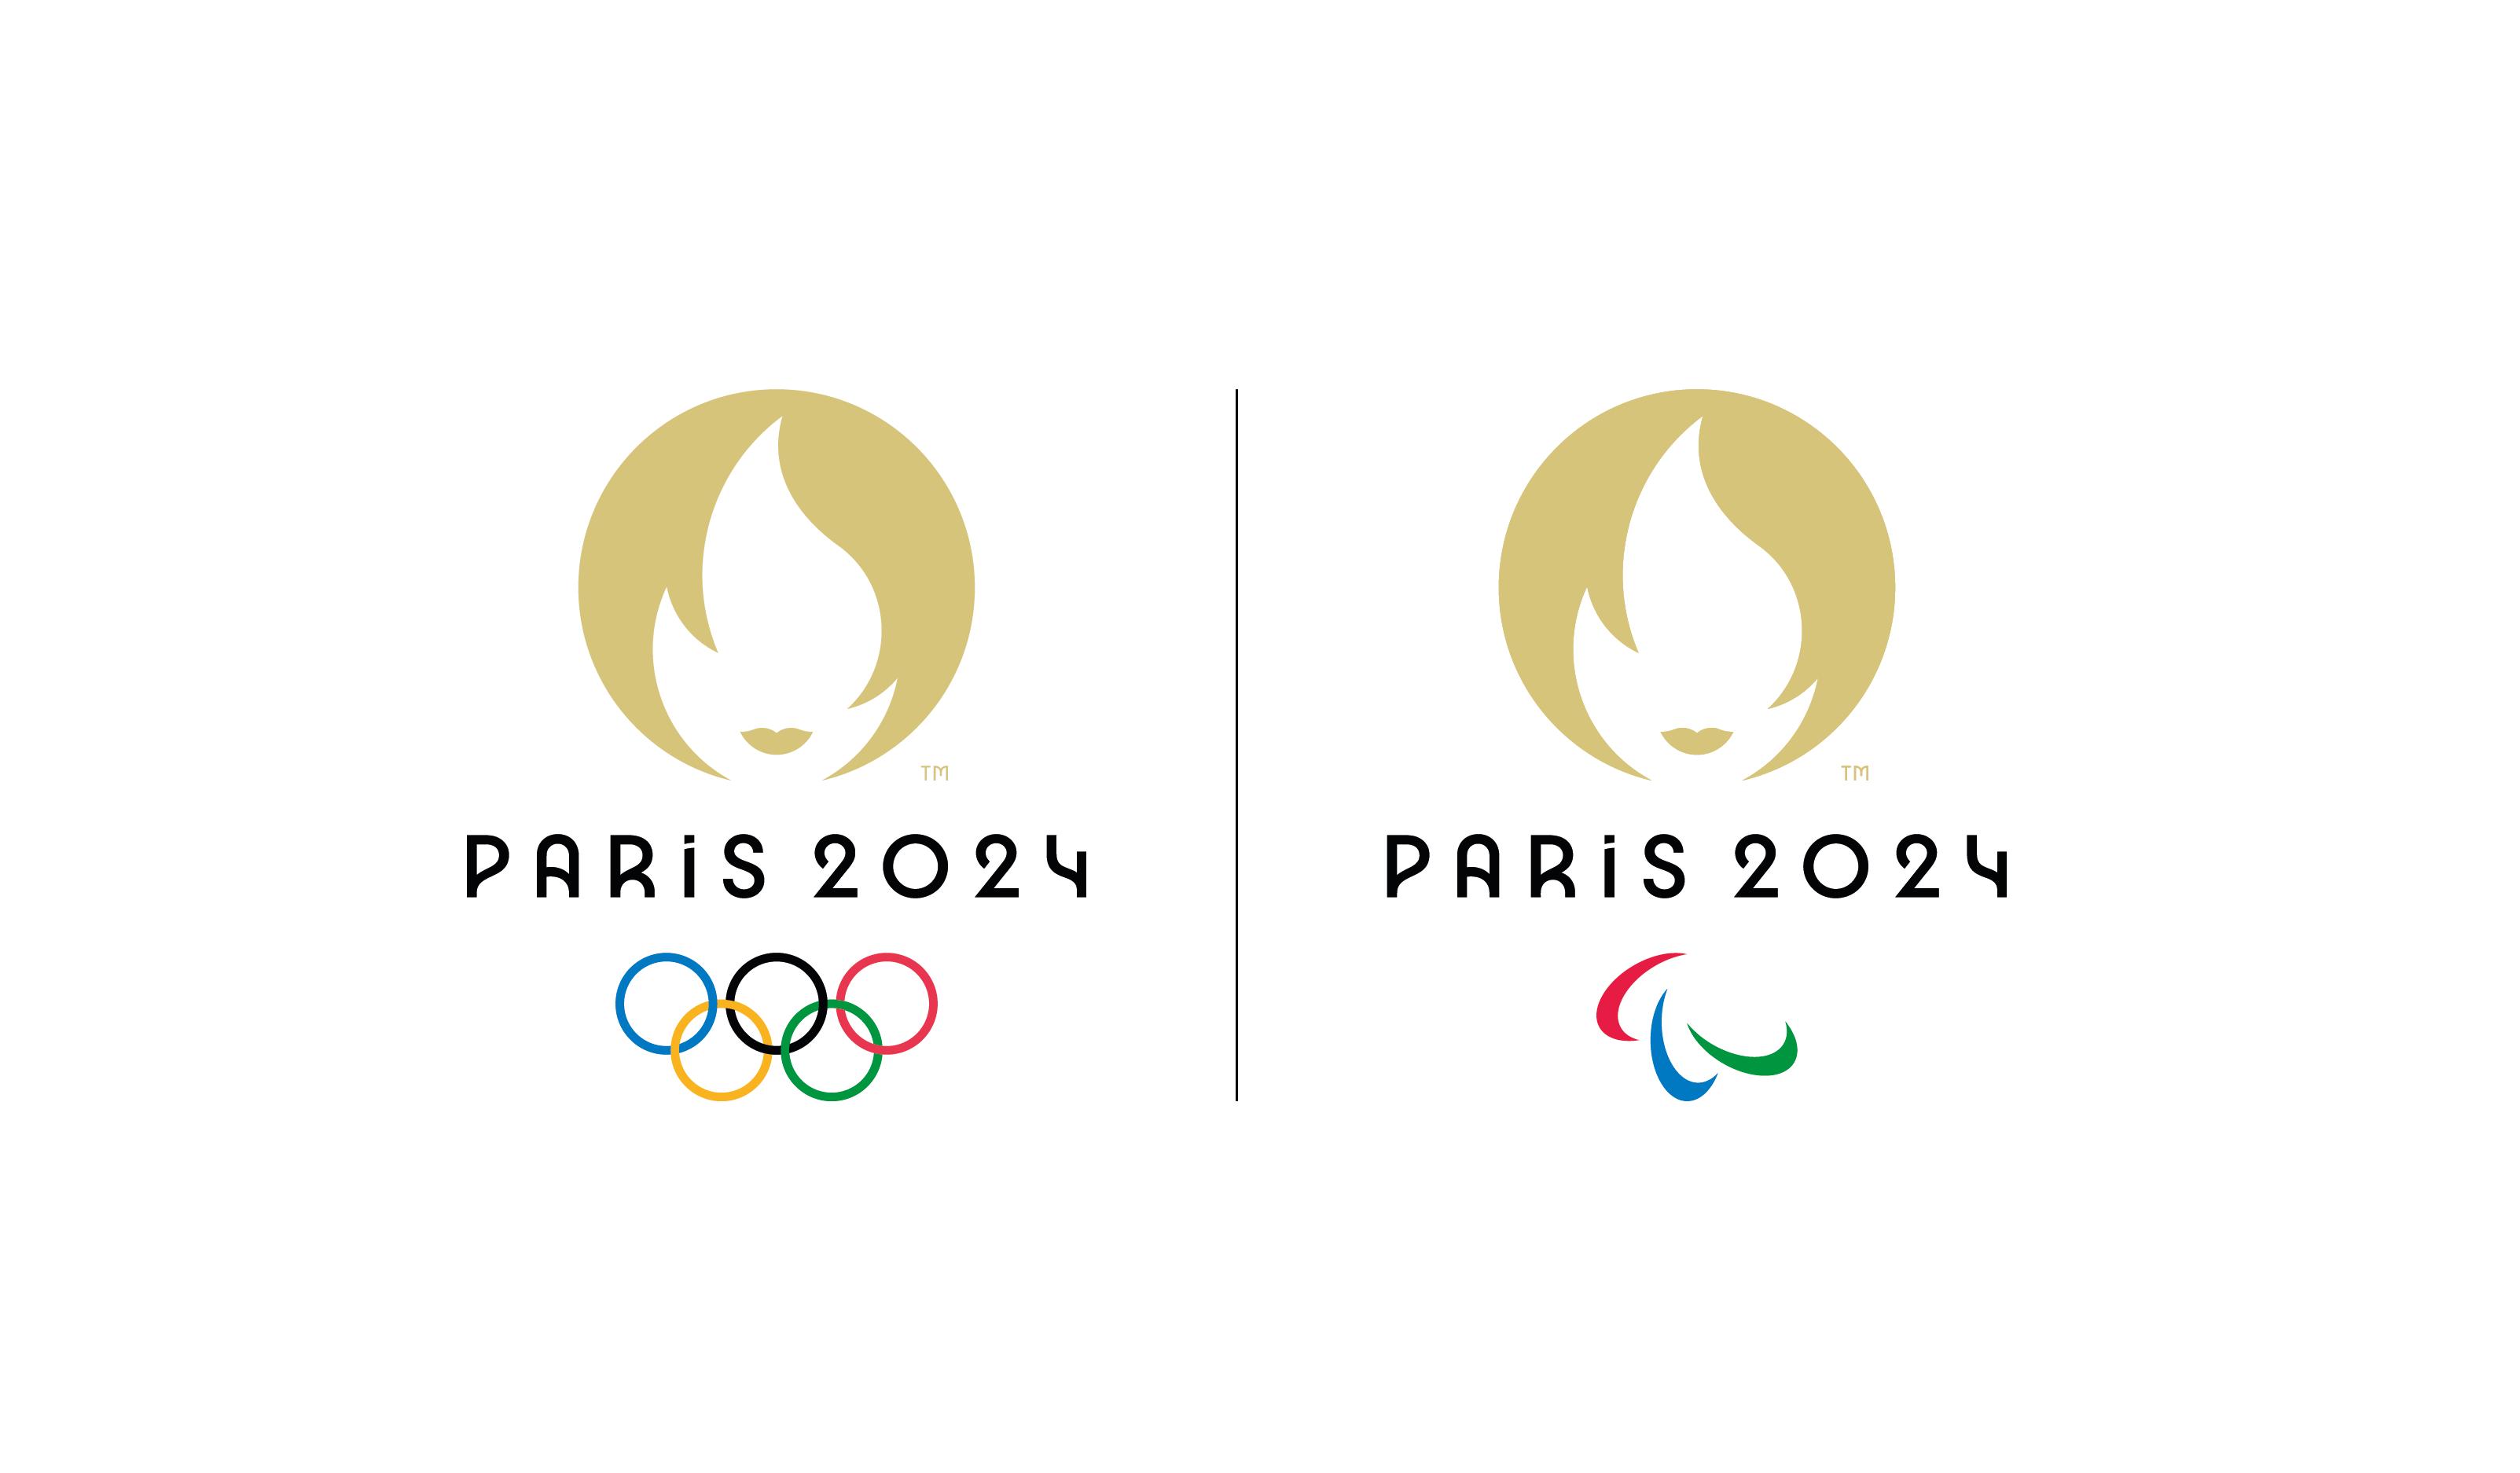 Paris 20 Raises Idea of Opening Ceremony Through Capital Streets ...